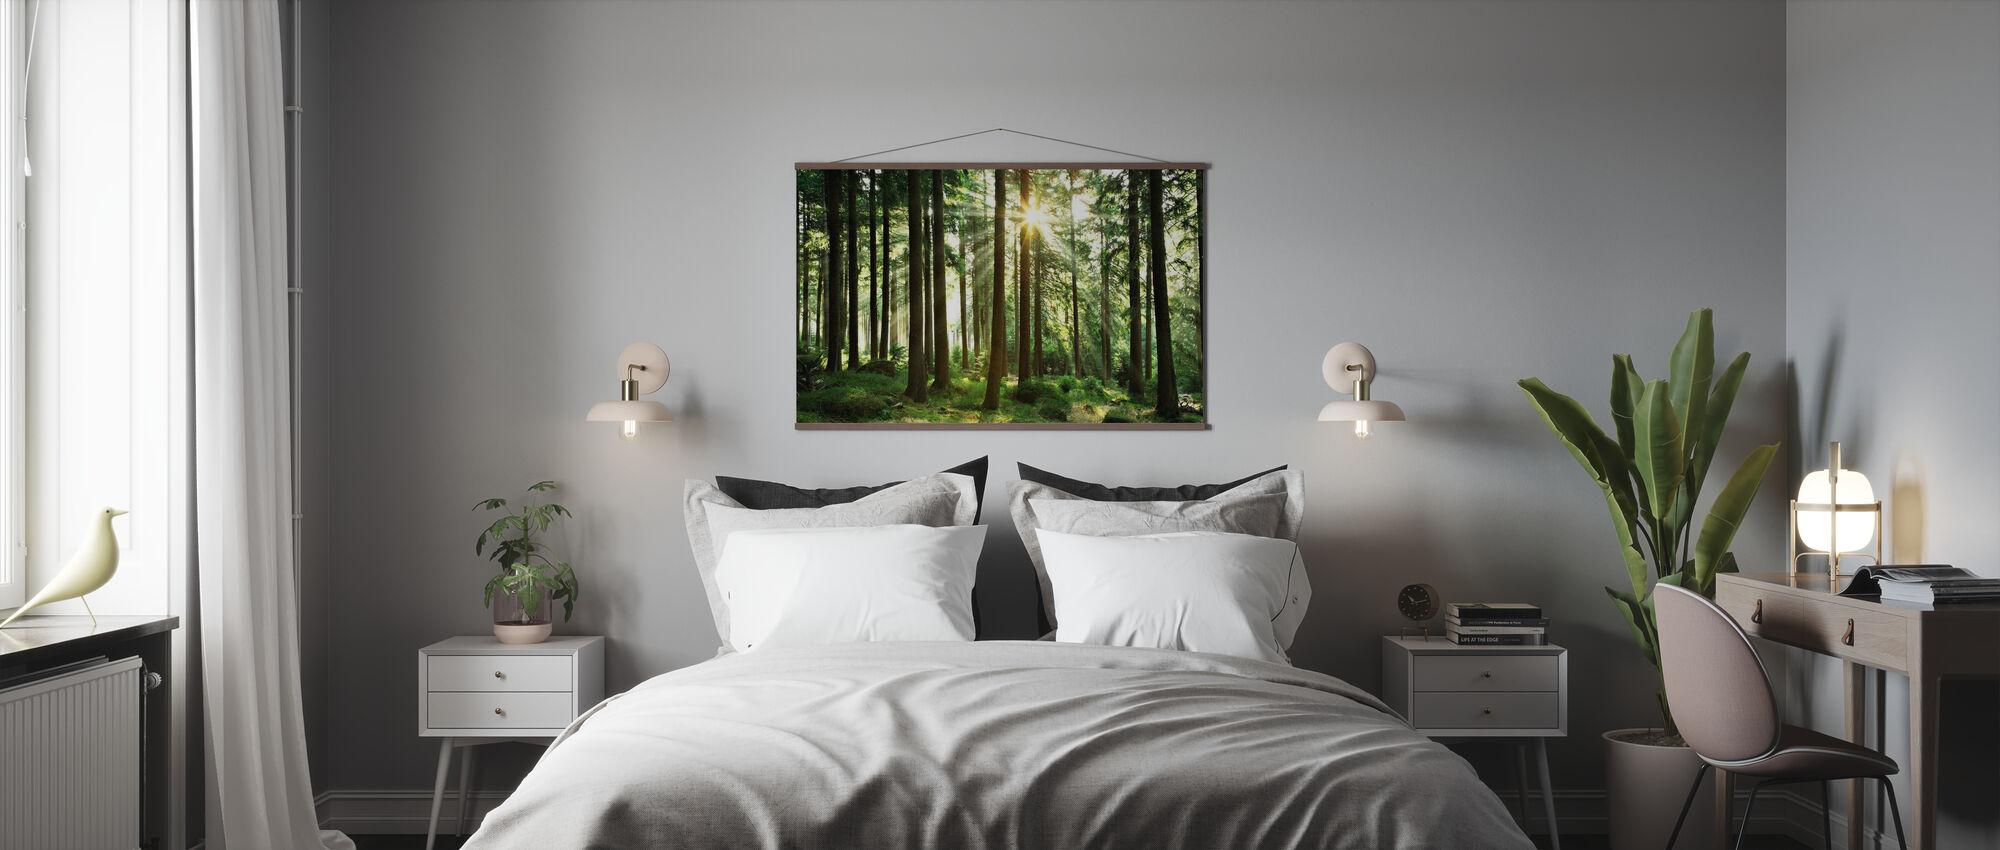 Sunbeam through Trees - Poster - Bedroom